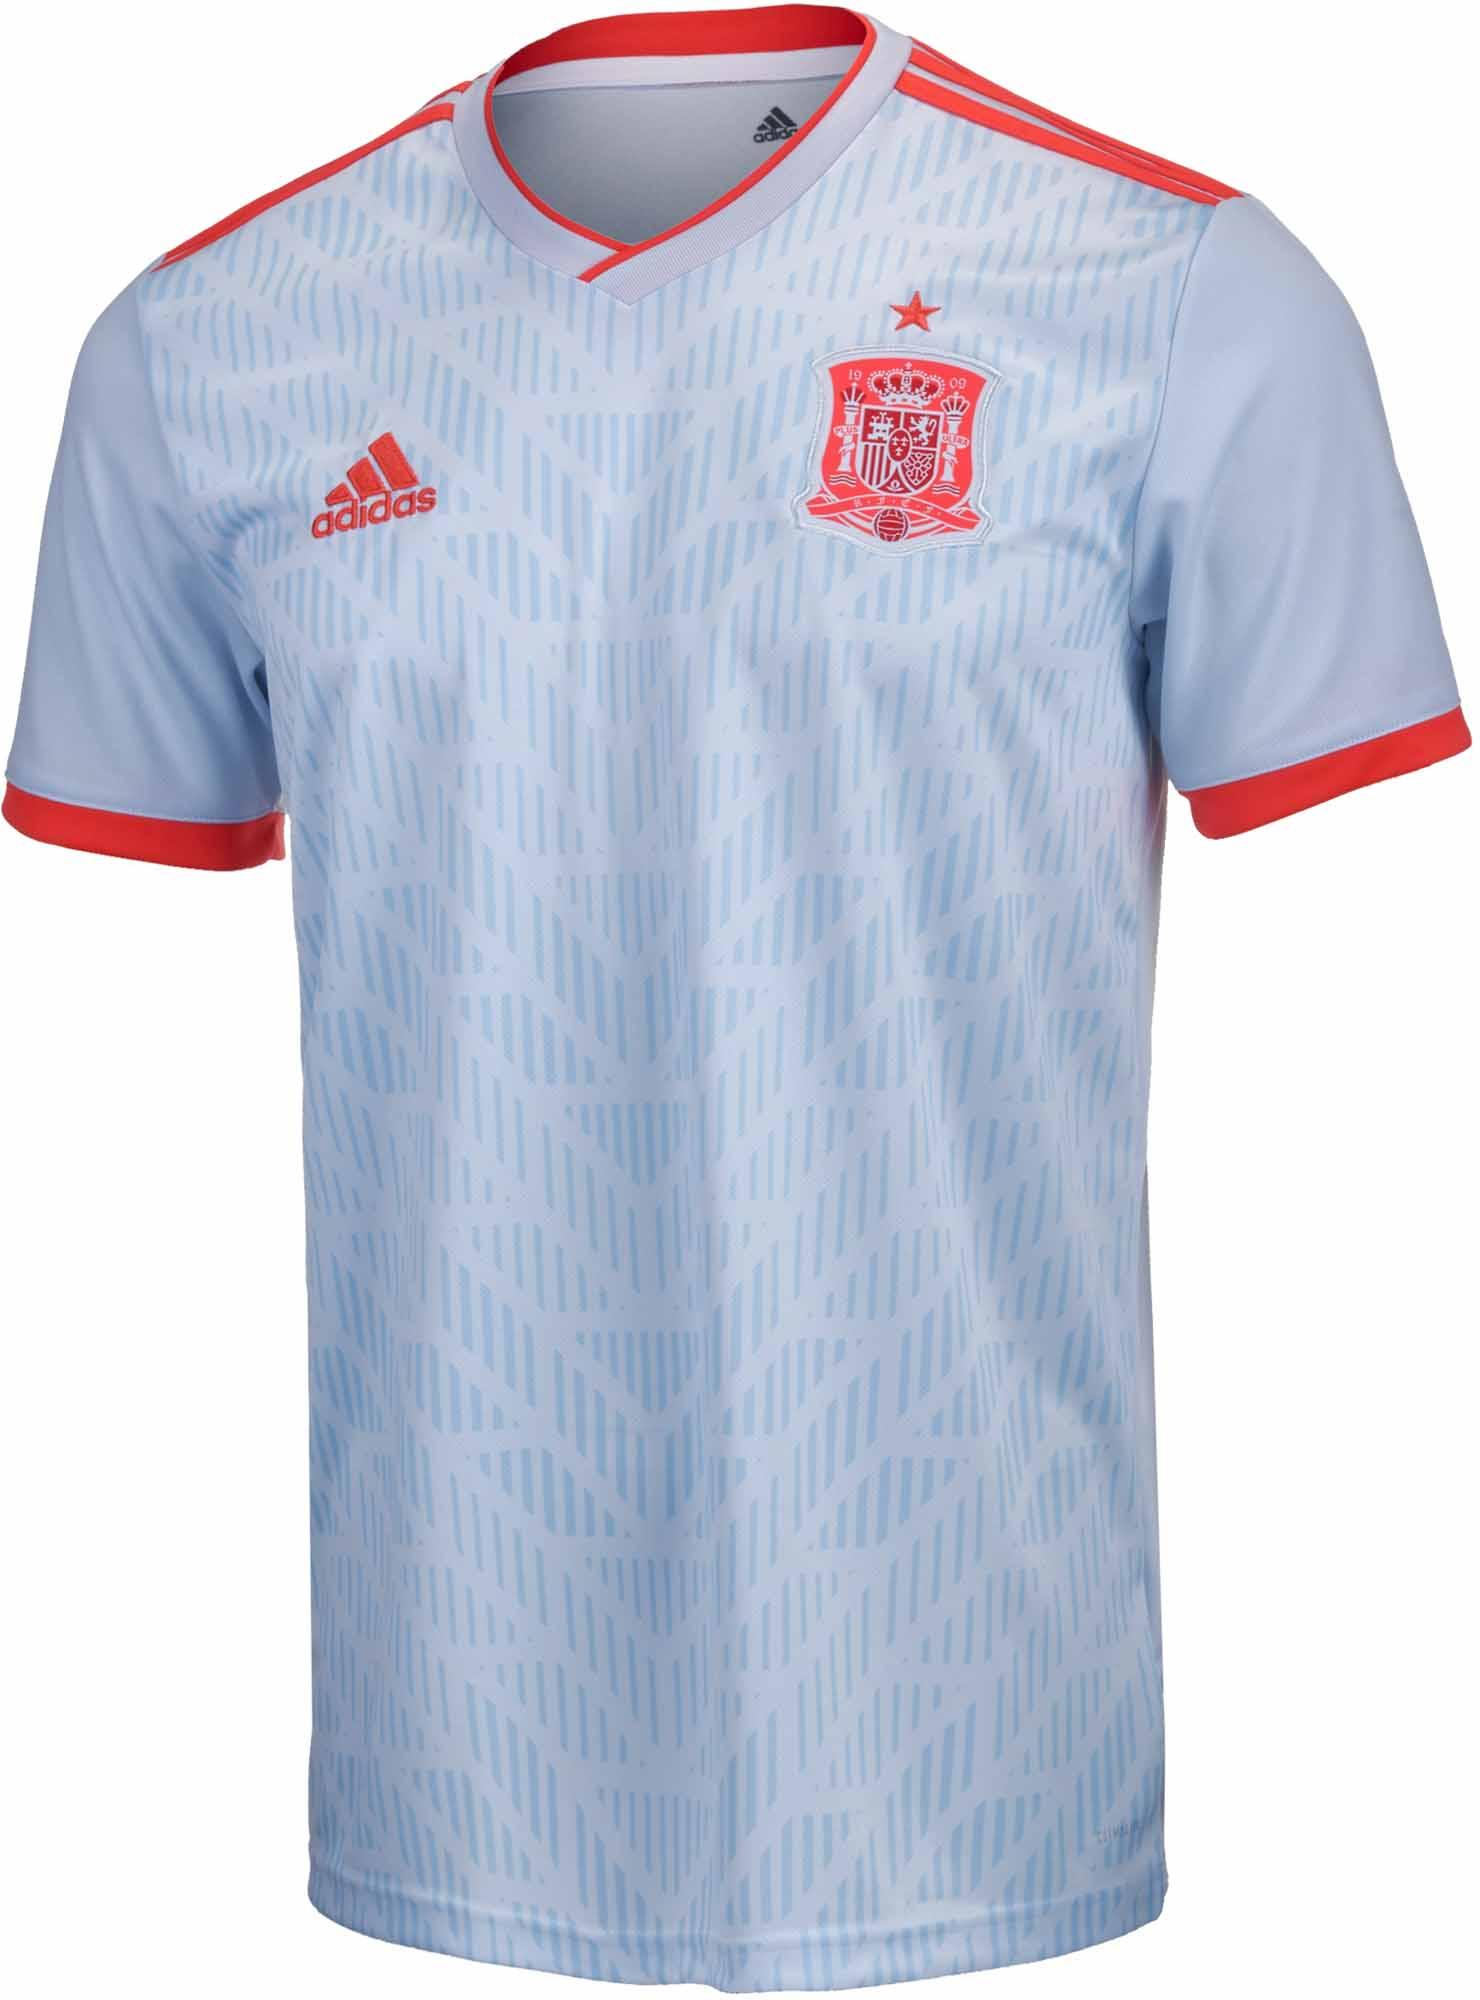 adidas Spain Away Jersey 2018-19 NS - Soccer Master 0bfa2591f